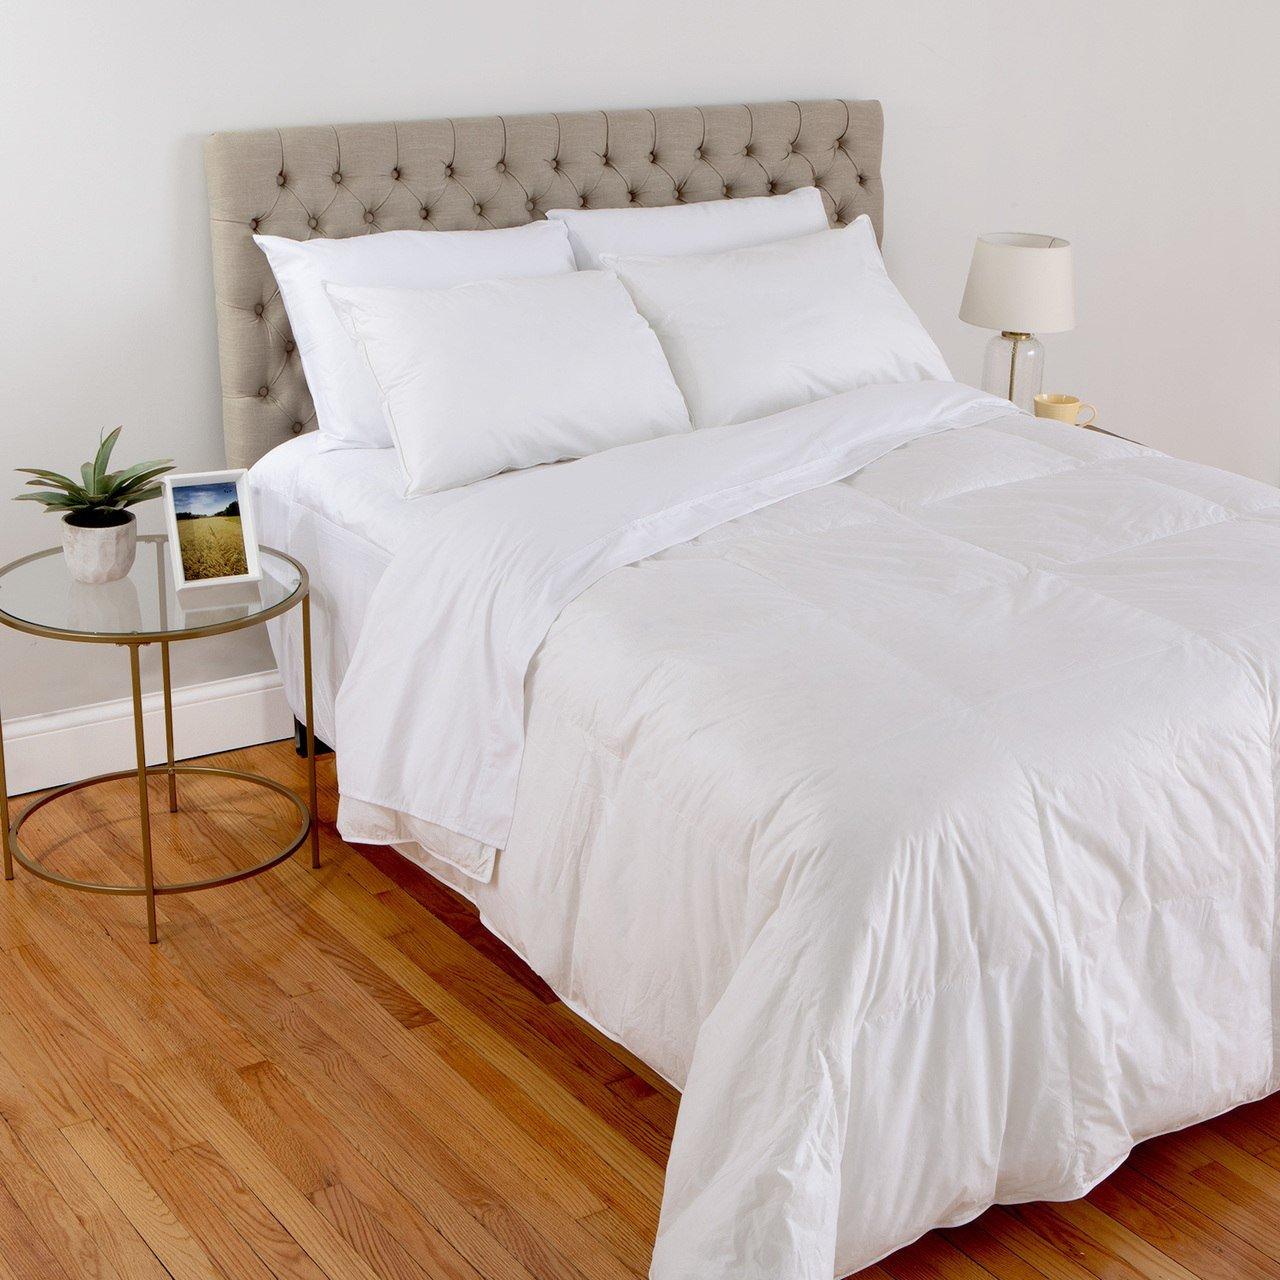 DOWNLITE Spa Luxe 700 Fill Power PurDown Lightweight Comforter (Twin XL)